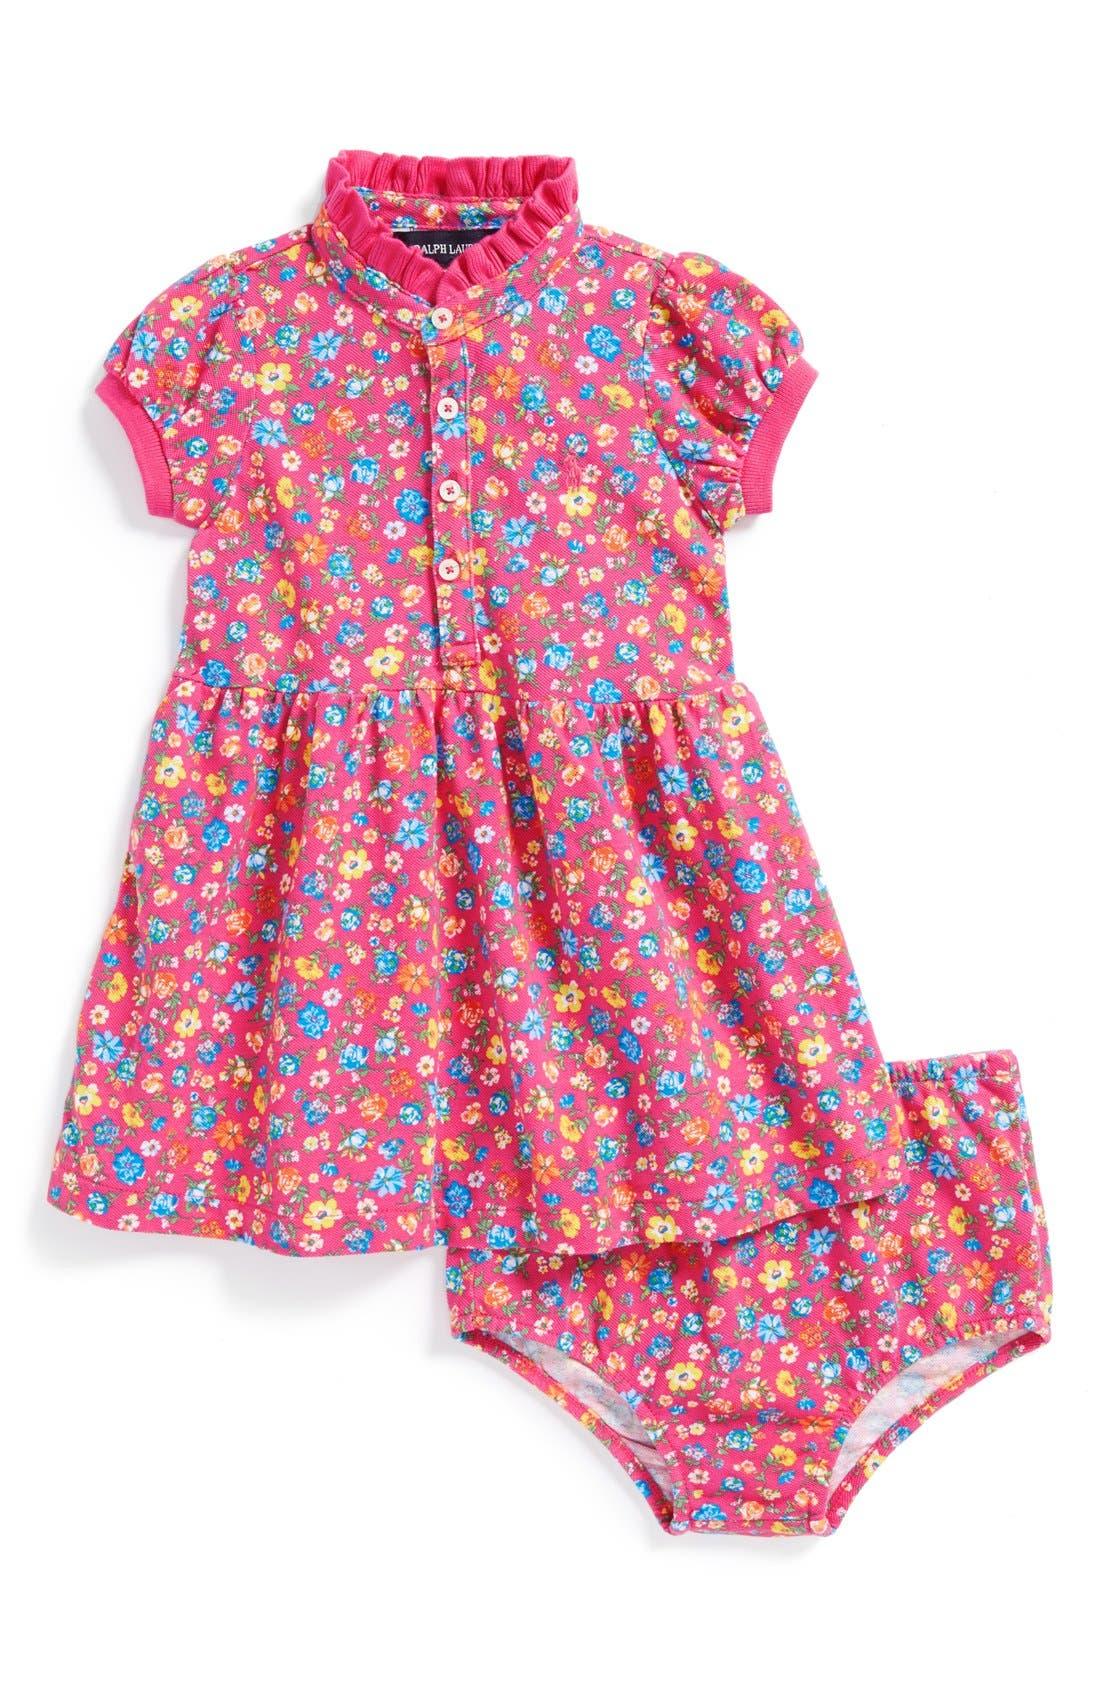 Alternate Image 1 Selected - Ralph Lauren Floral Mesh Dress & Bloomers (Baby Girls)